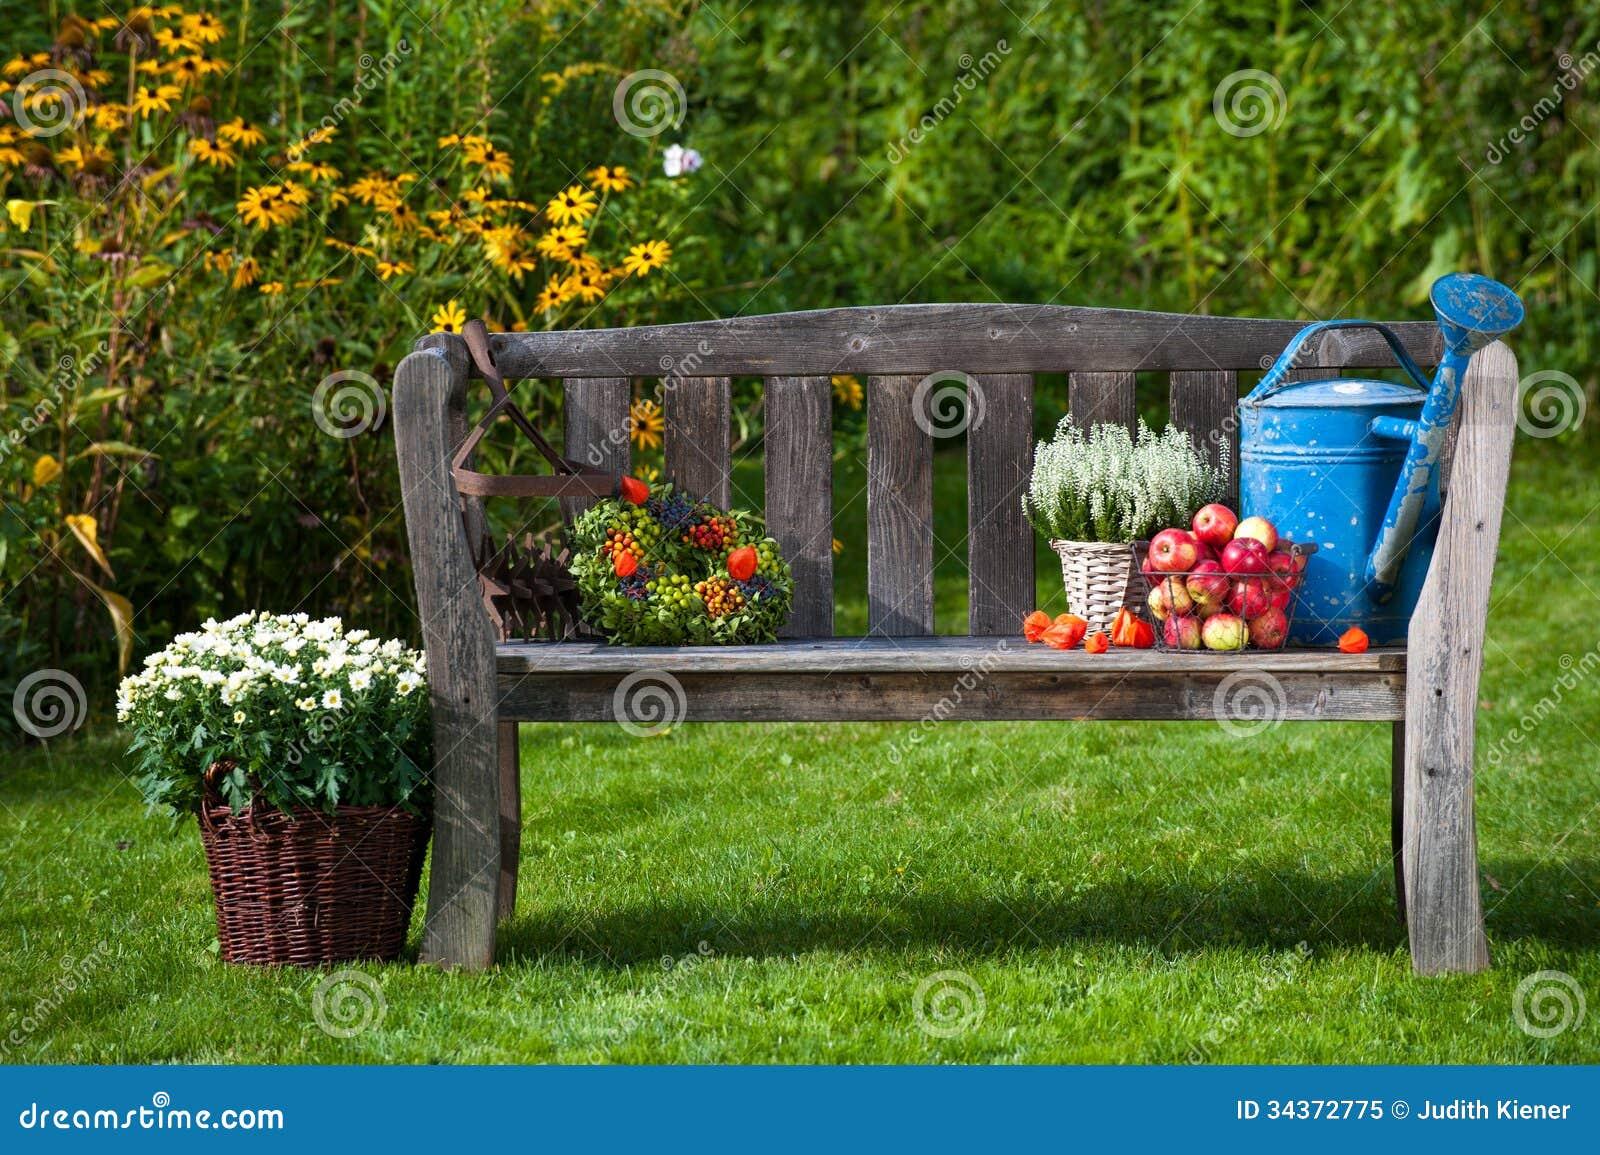 garden design garden design with golden autumn garden on the town